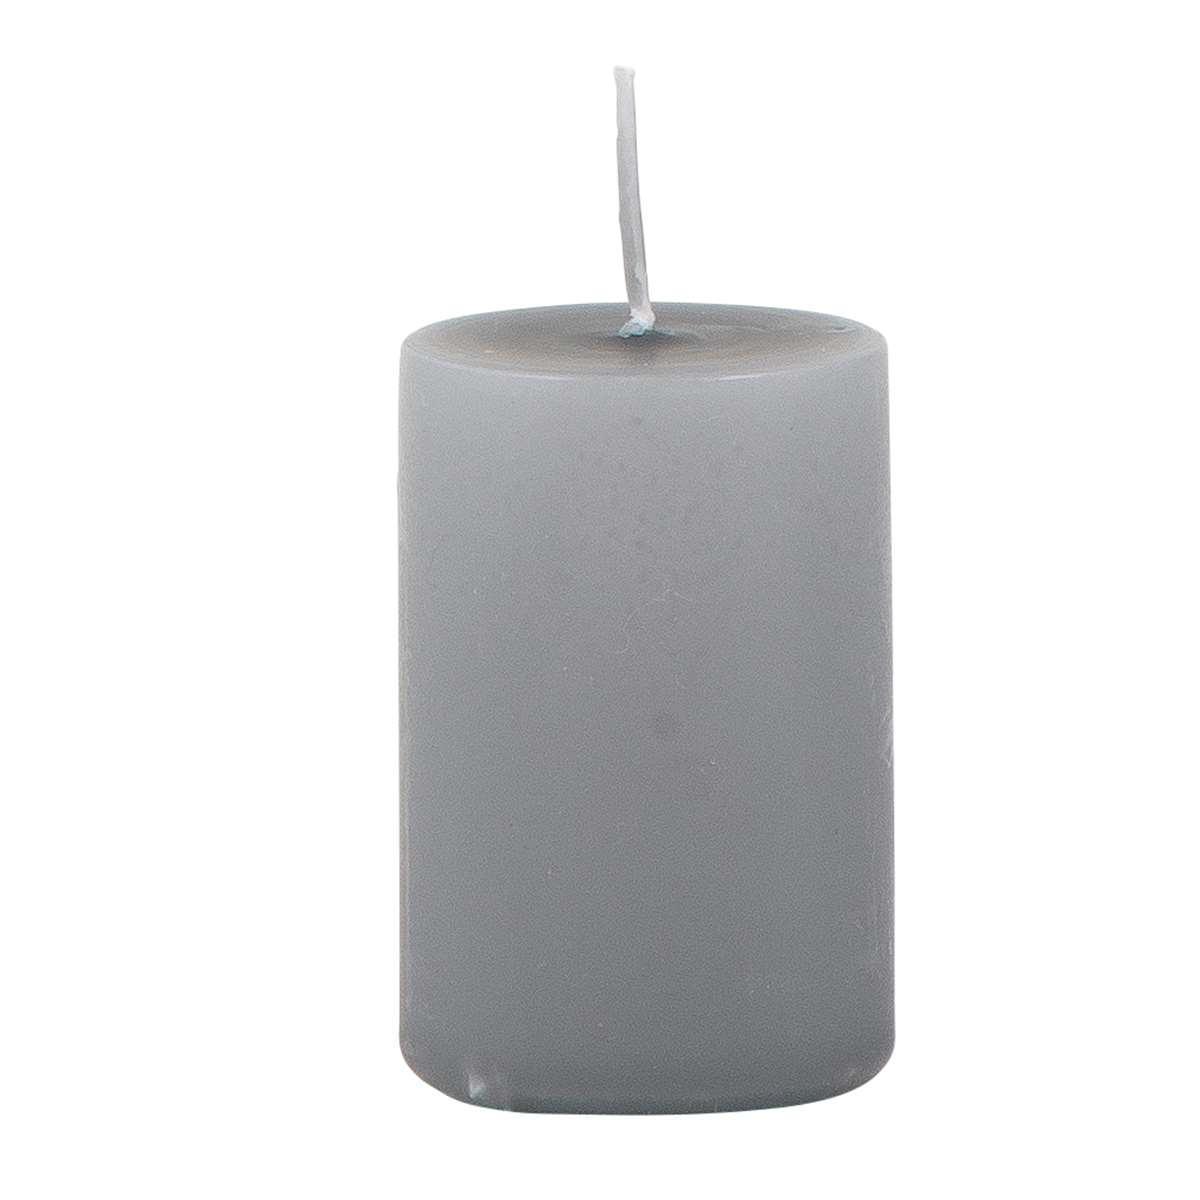 IB LAURSEN Svíčka Dark grey 6 cm, šedá barva, vosk